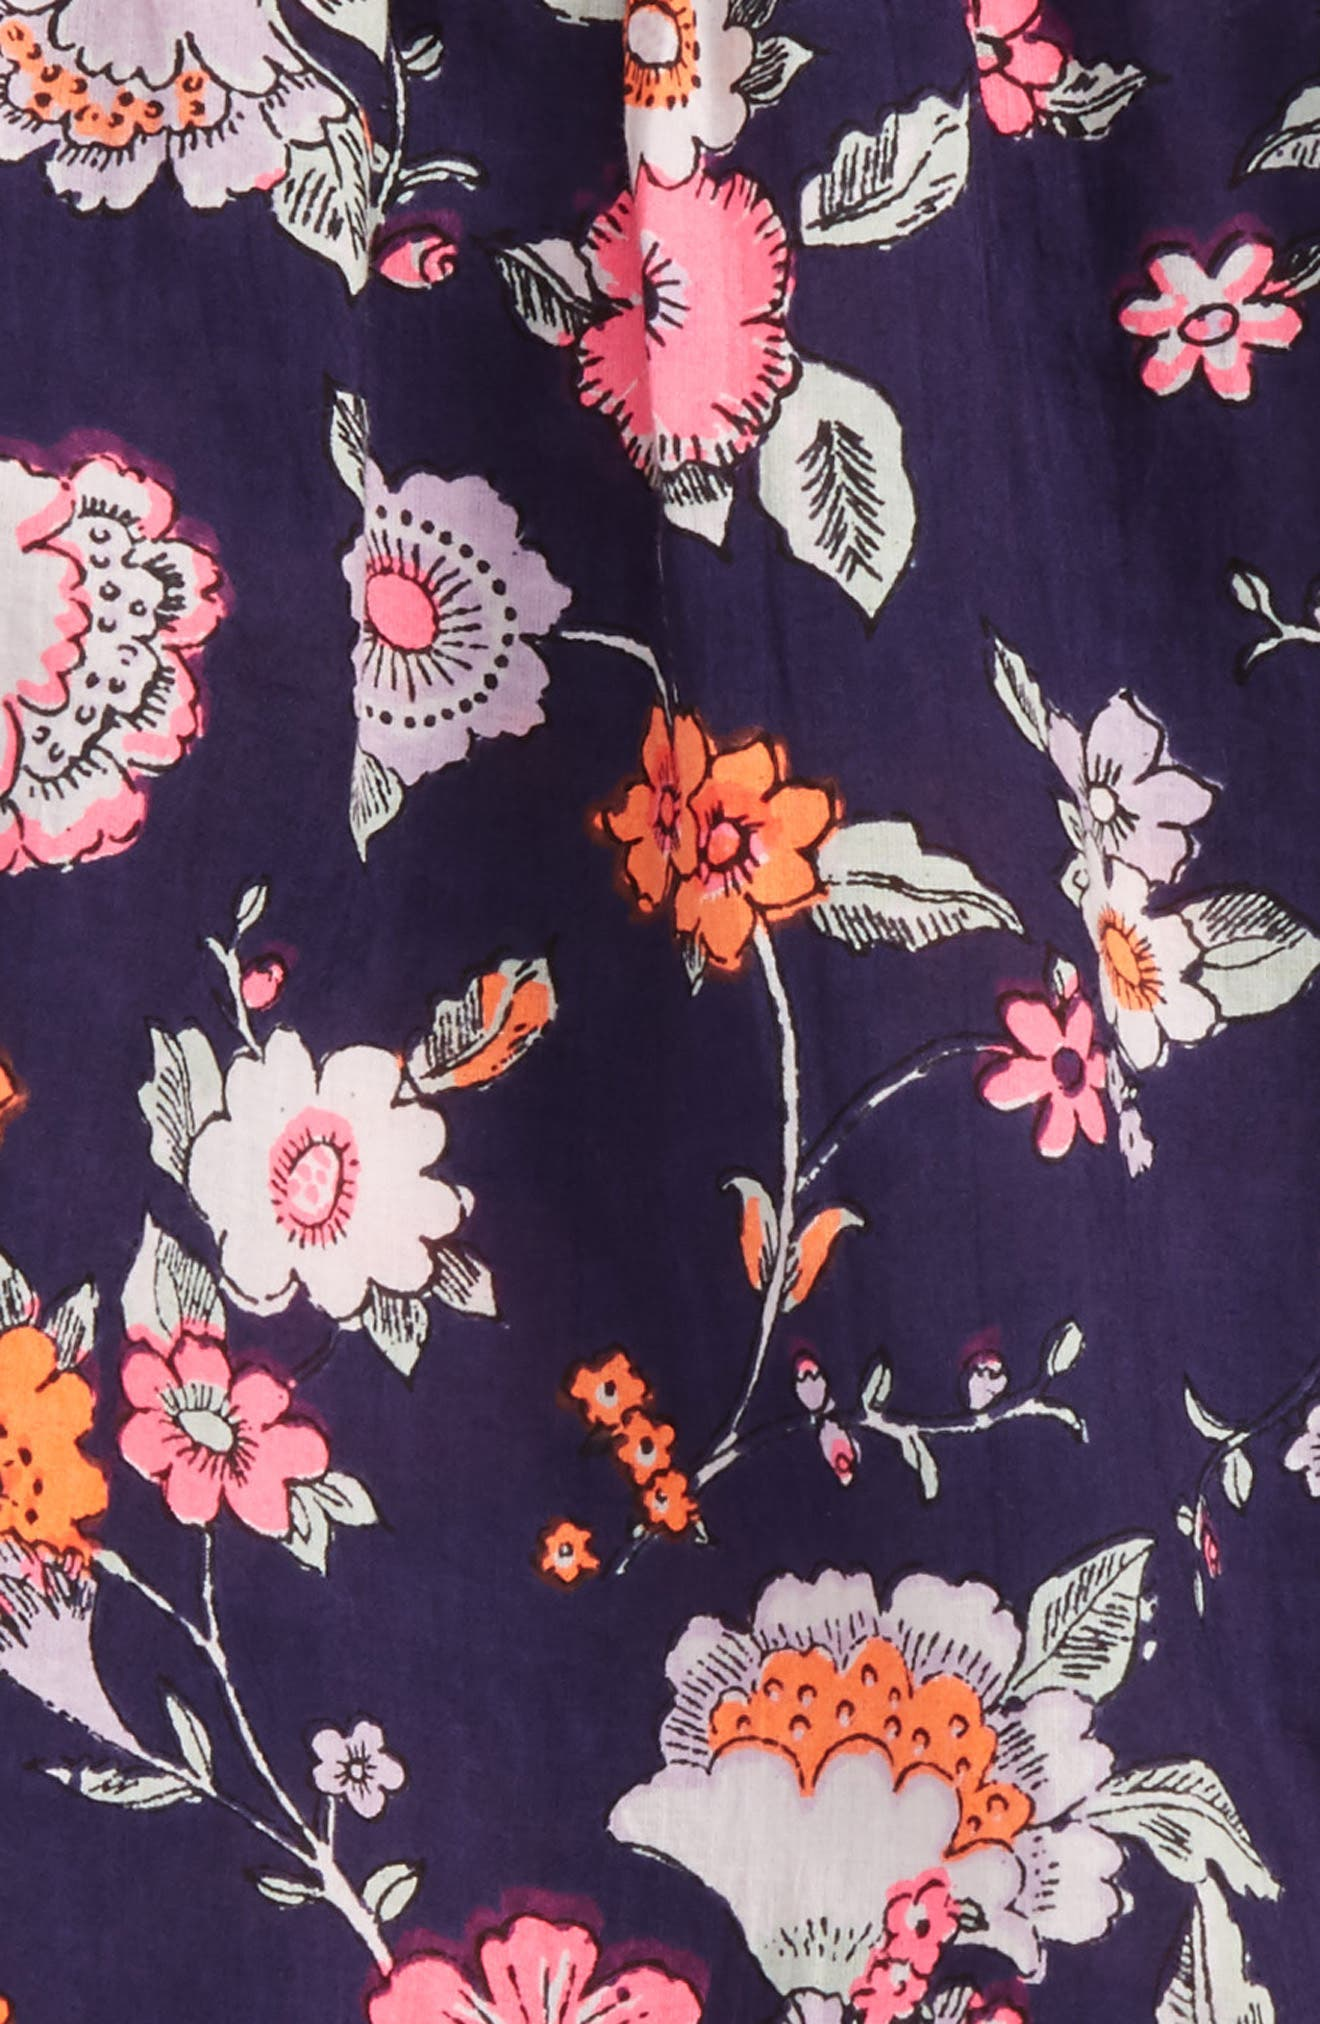 Floral Print Romper,                         Main,                         color, 410